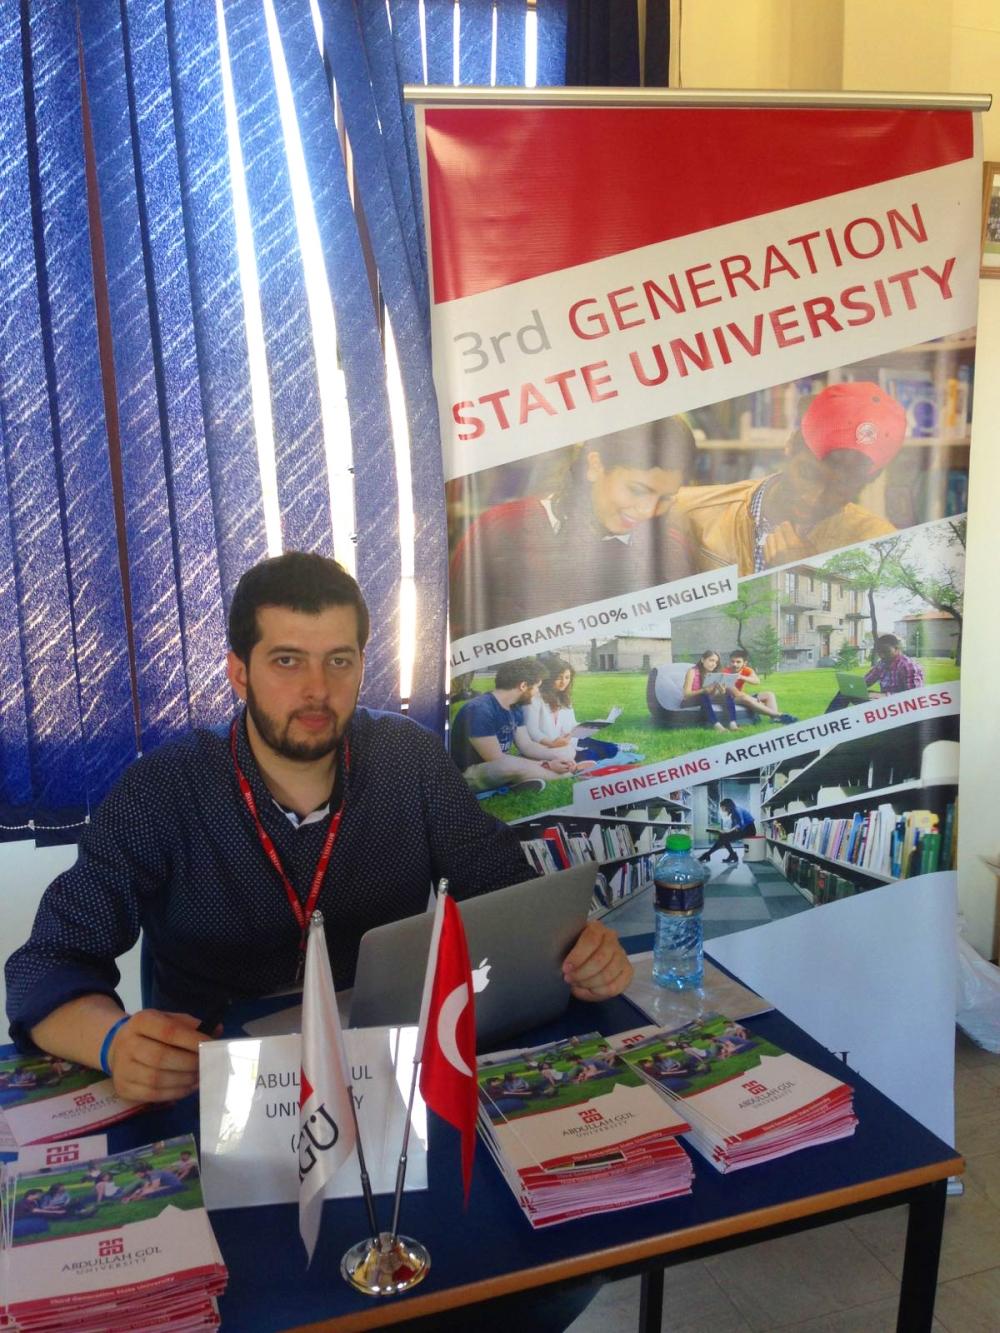 Abdullah Gül University, AGU, Fair stand, Third Generation, State University, Study in Turkey, All programs, 100%, English, Engineering, Architecture, Business, Africa, Student Fair, Kenya, Tanzania, Apply to AGU